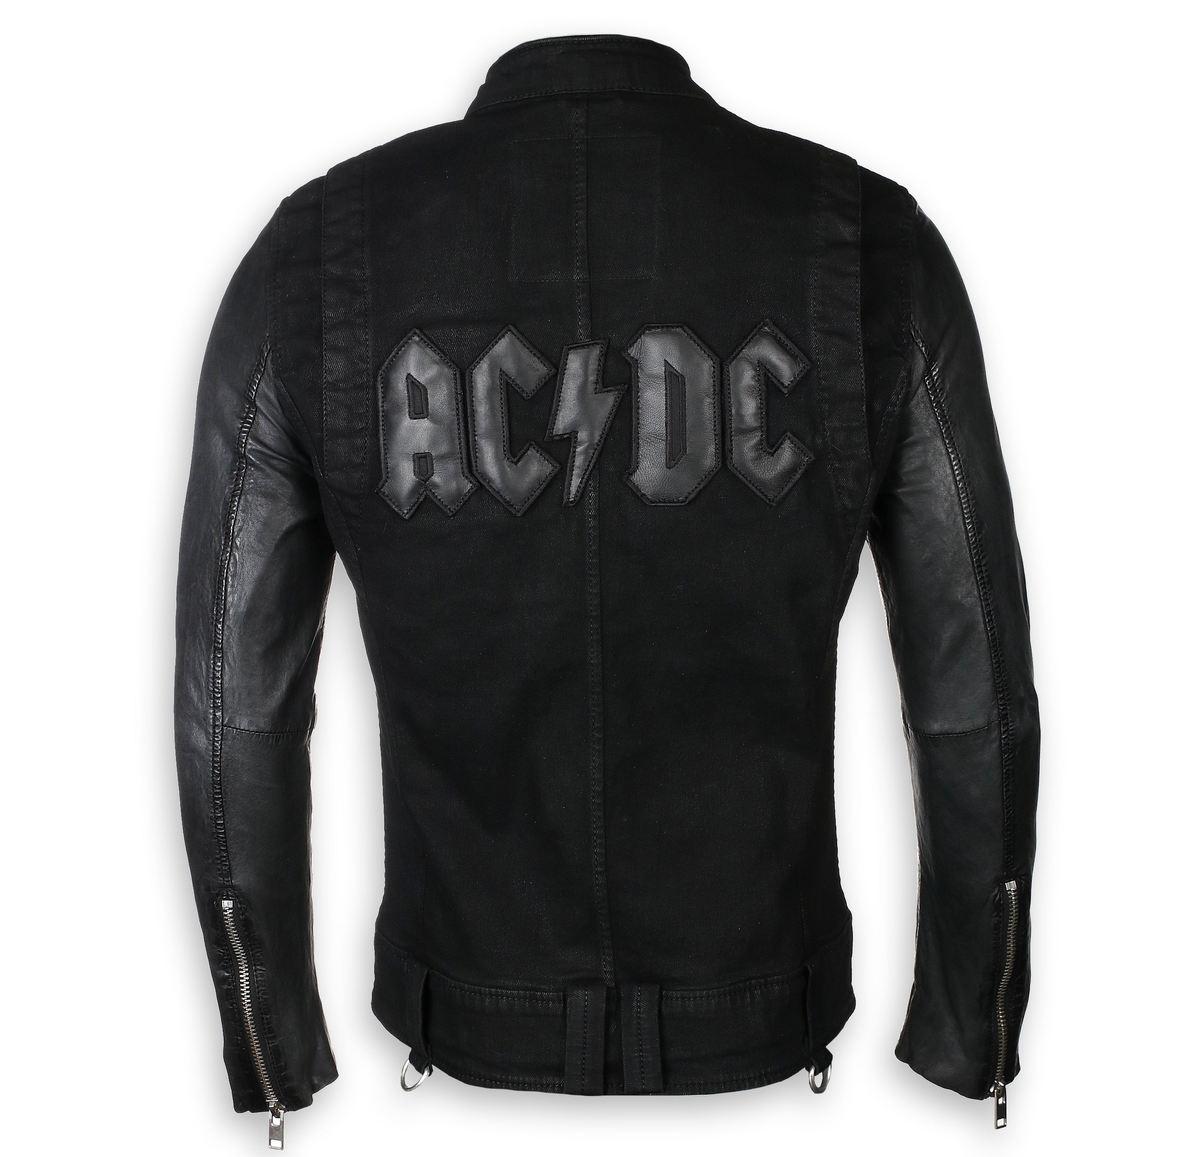 Hoodies & Sweatshirts Shop For Cheap Fashion Super Cool Film Star Wars Darth Vader Hoodies Winter Jacket Hardrock Death Punk Black Metal Sweatshirt Fleece